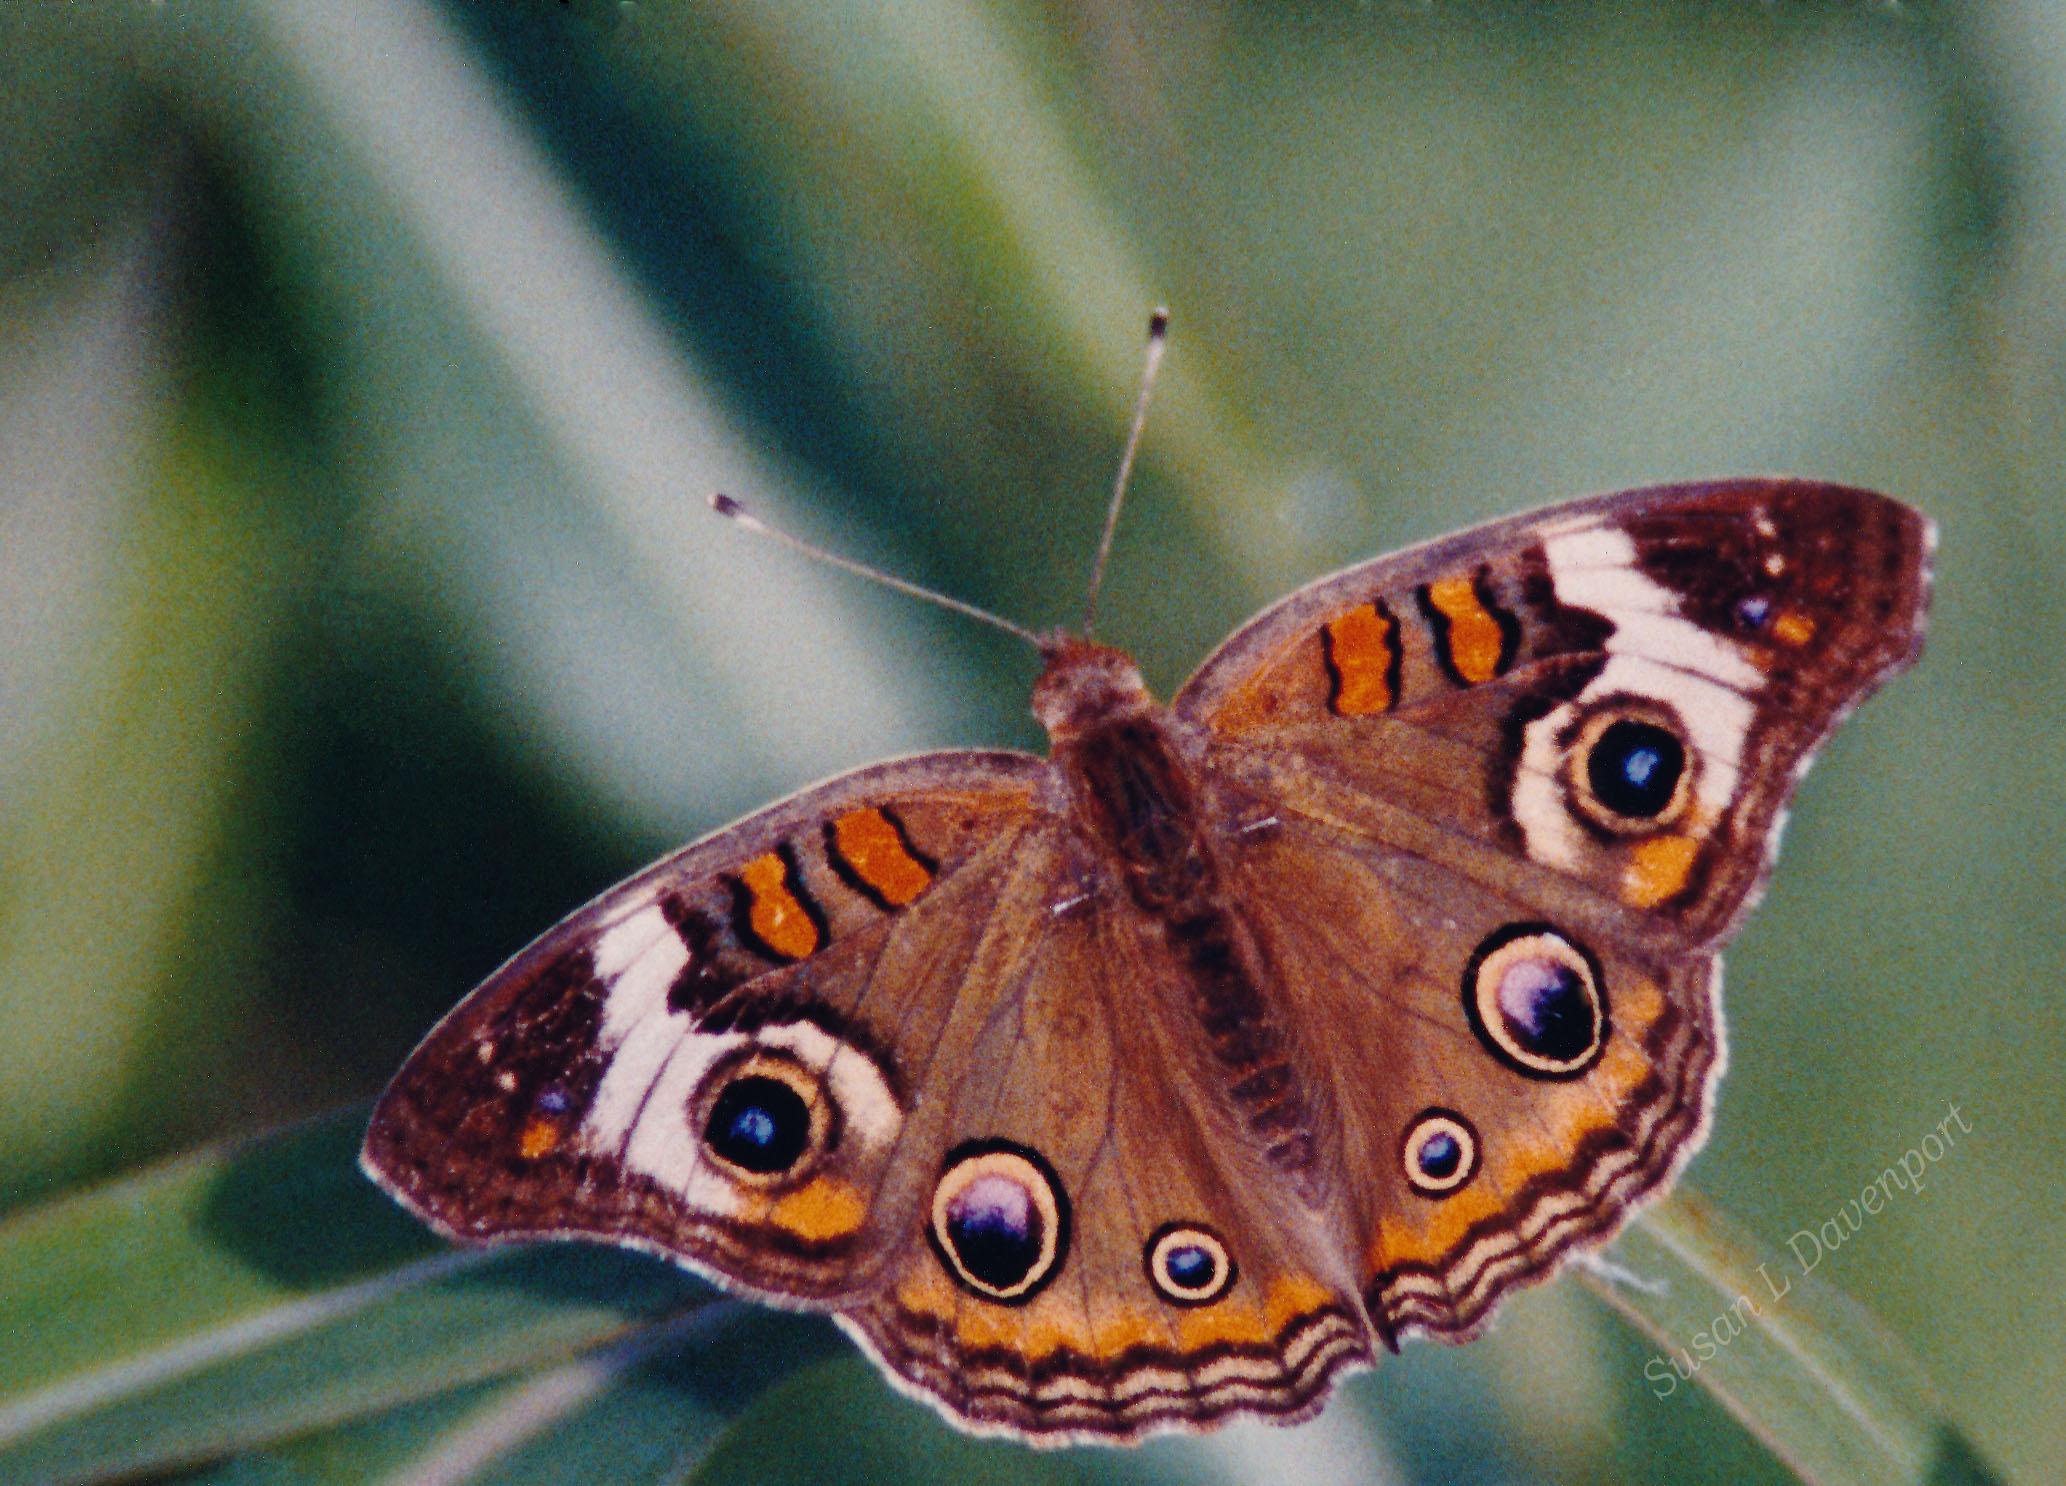 Common Buckeye - Photo by Susan L. Davenport